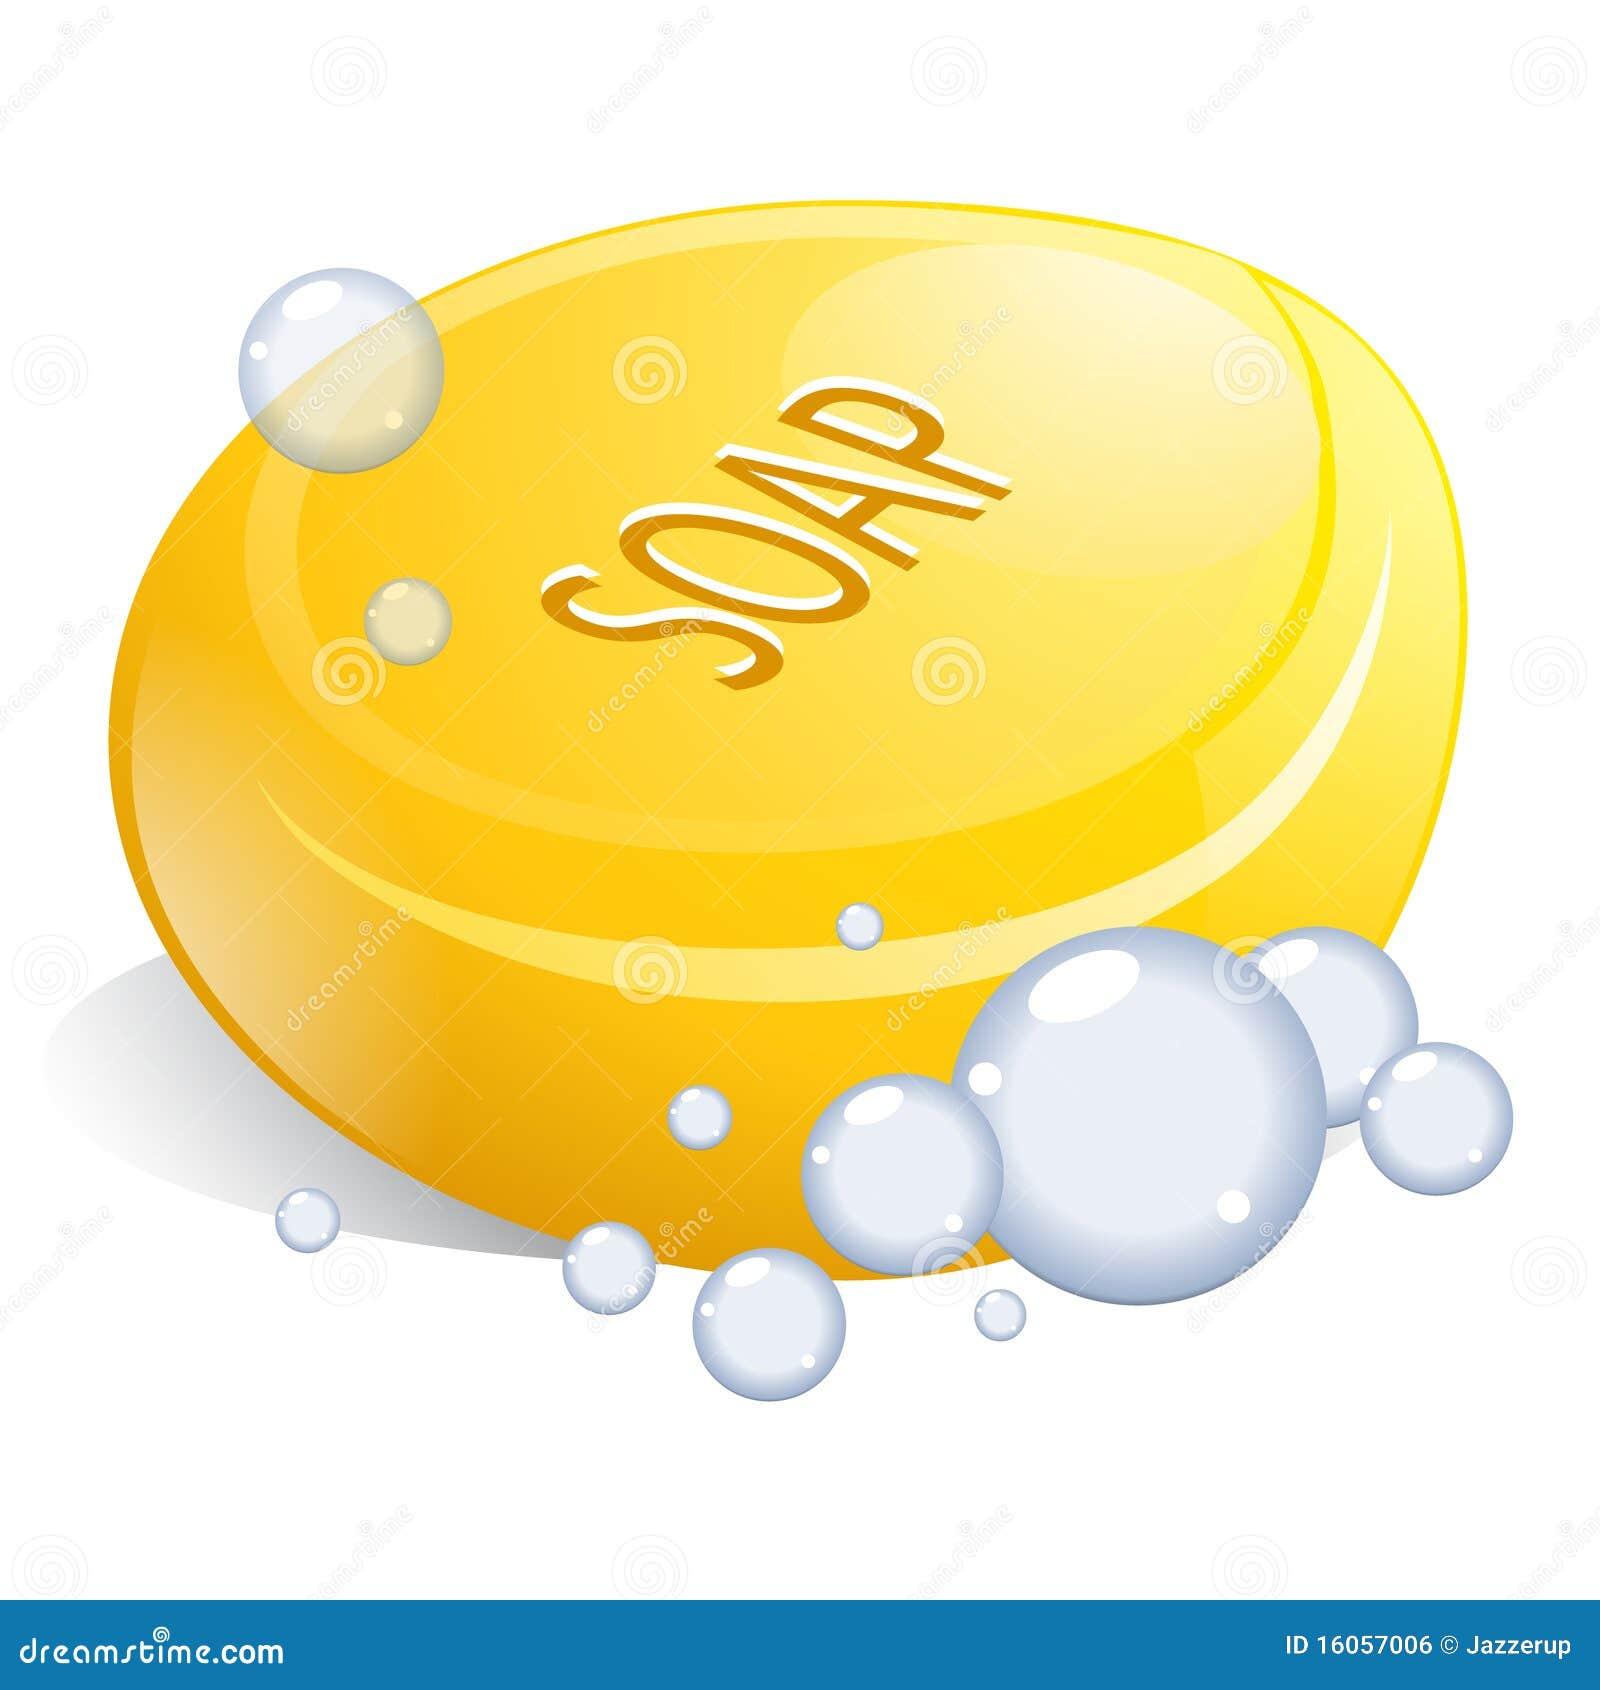 Soap Royalty Free Stock Image